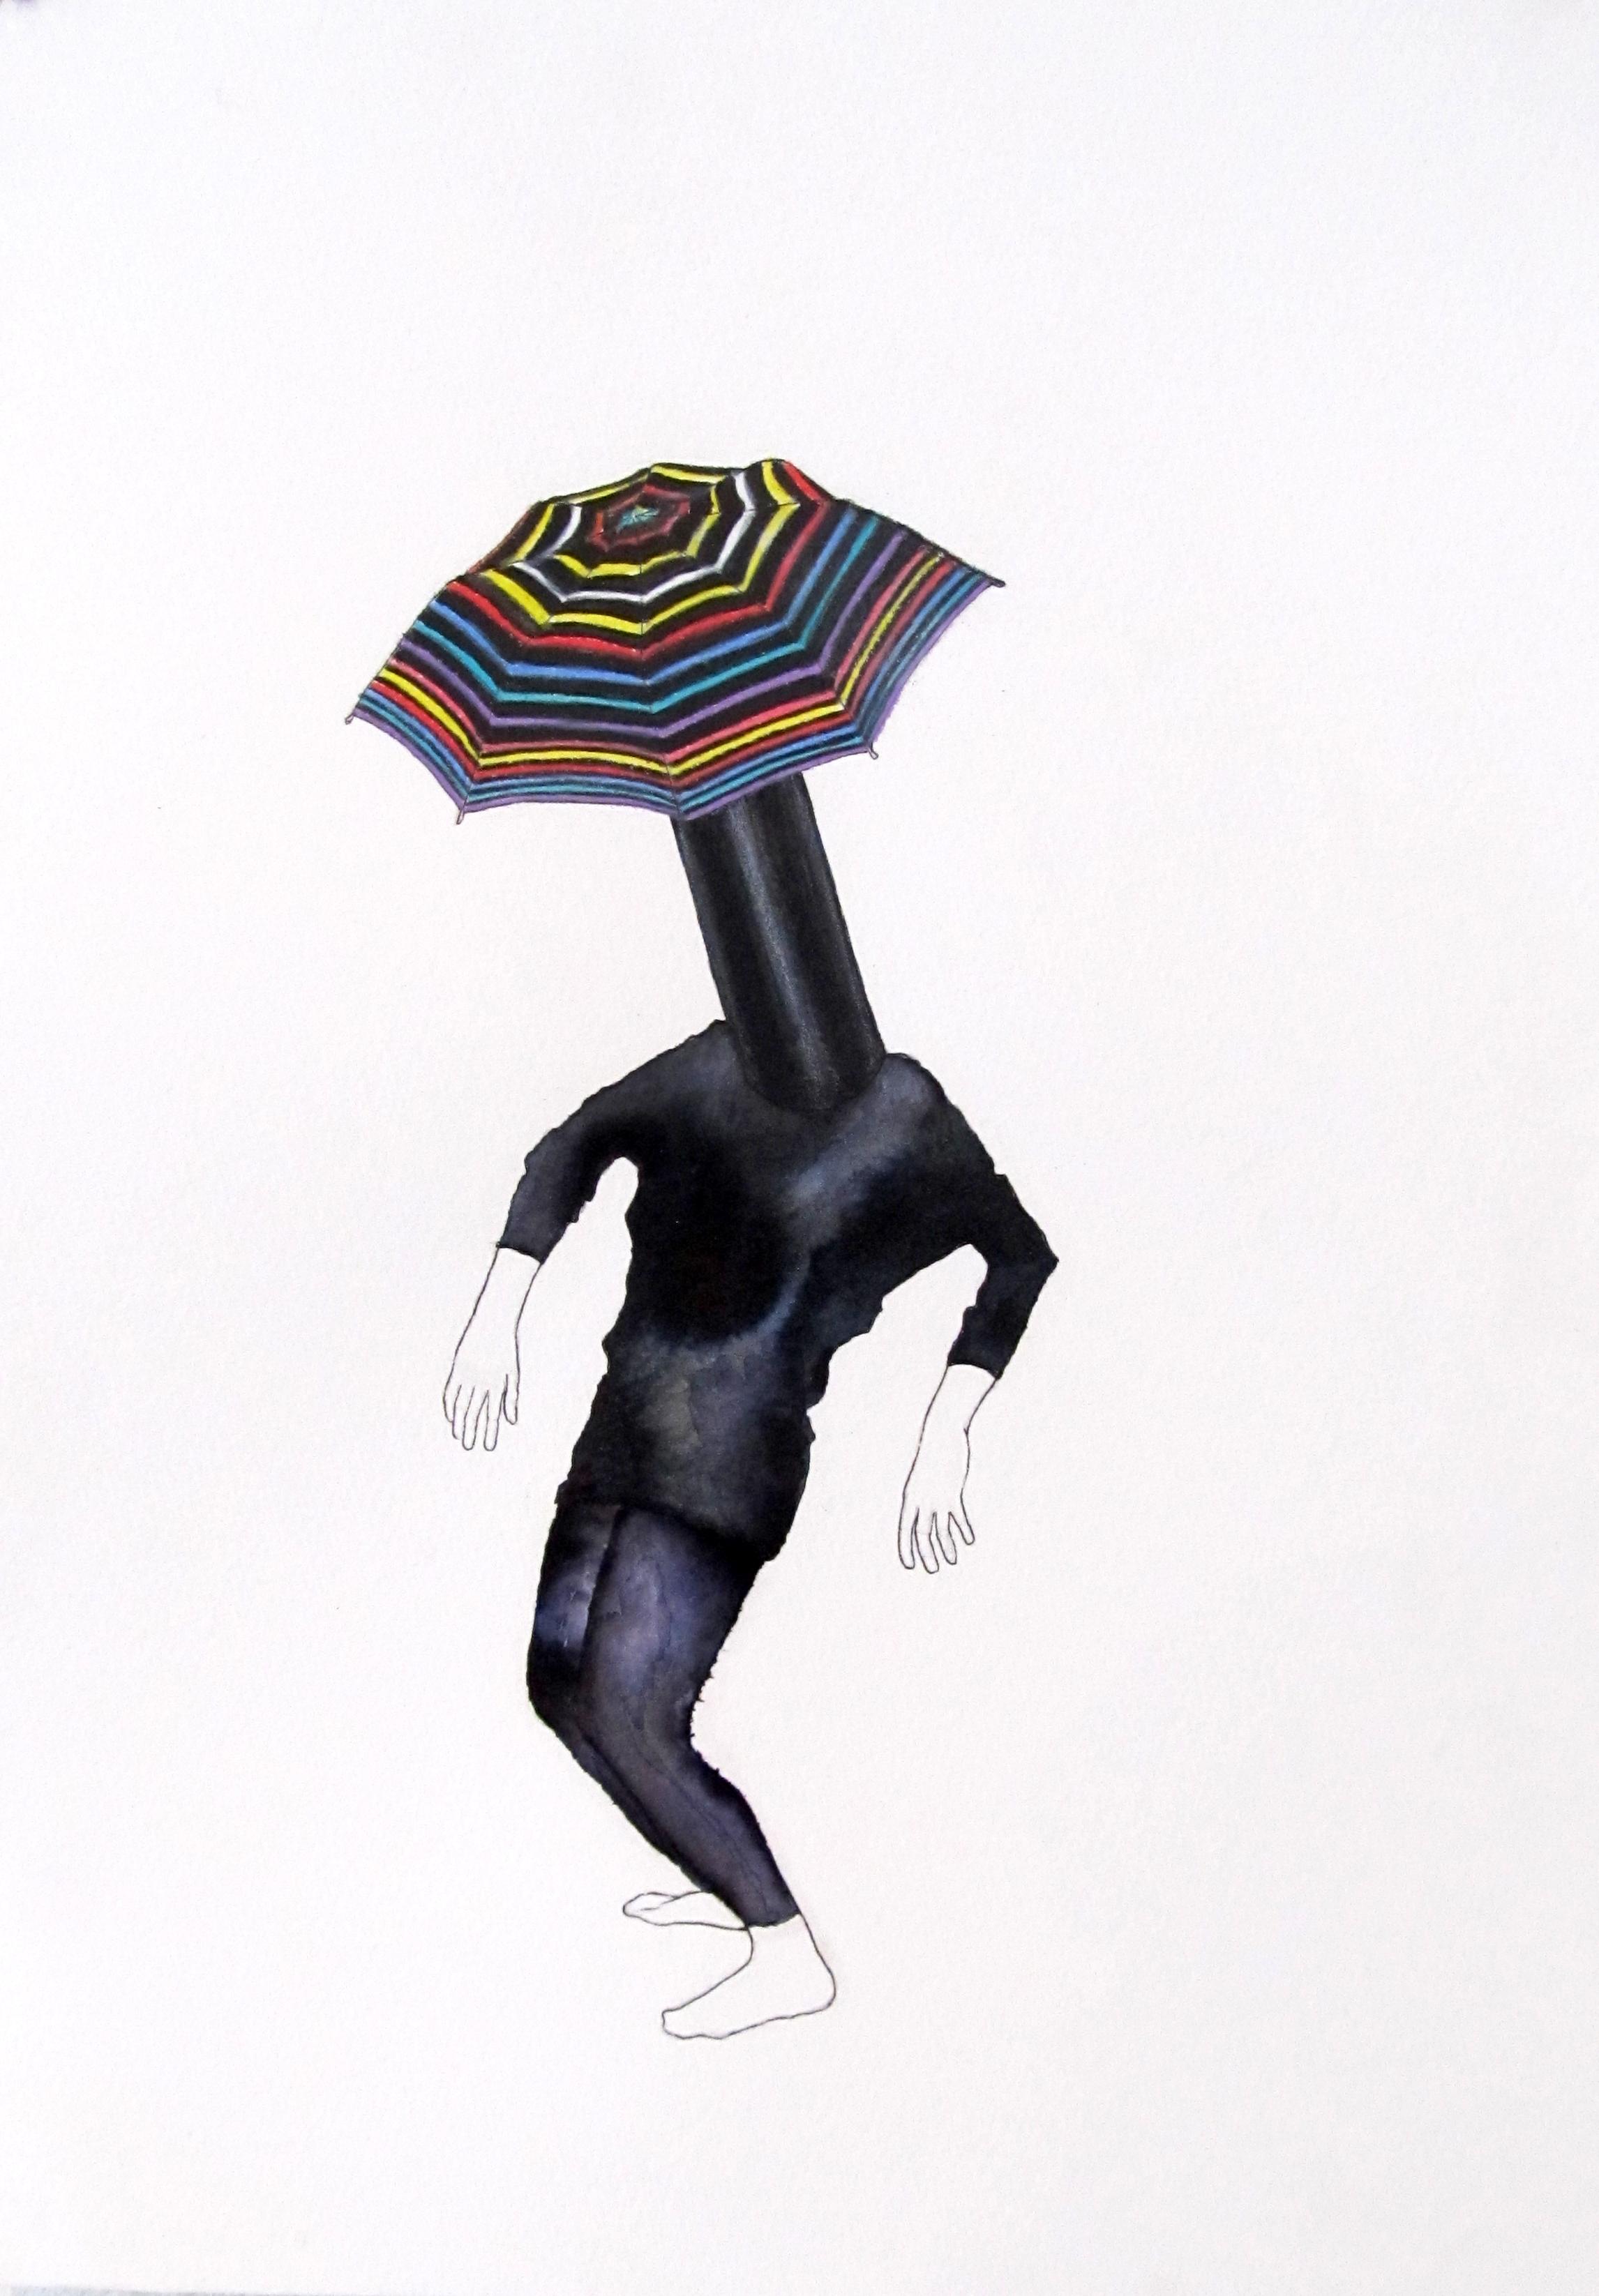 Umbrella-head (wise class clown) / 24 x 34 cm / Colored pencil & ink on paper